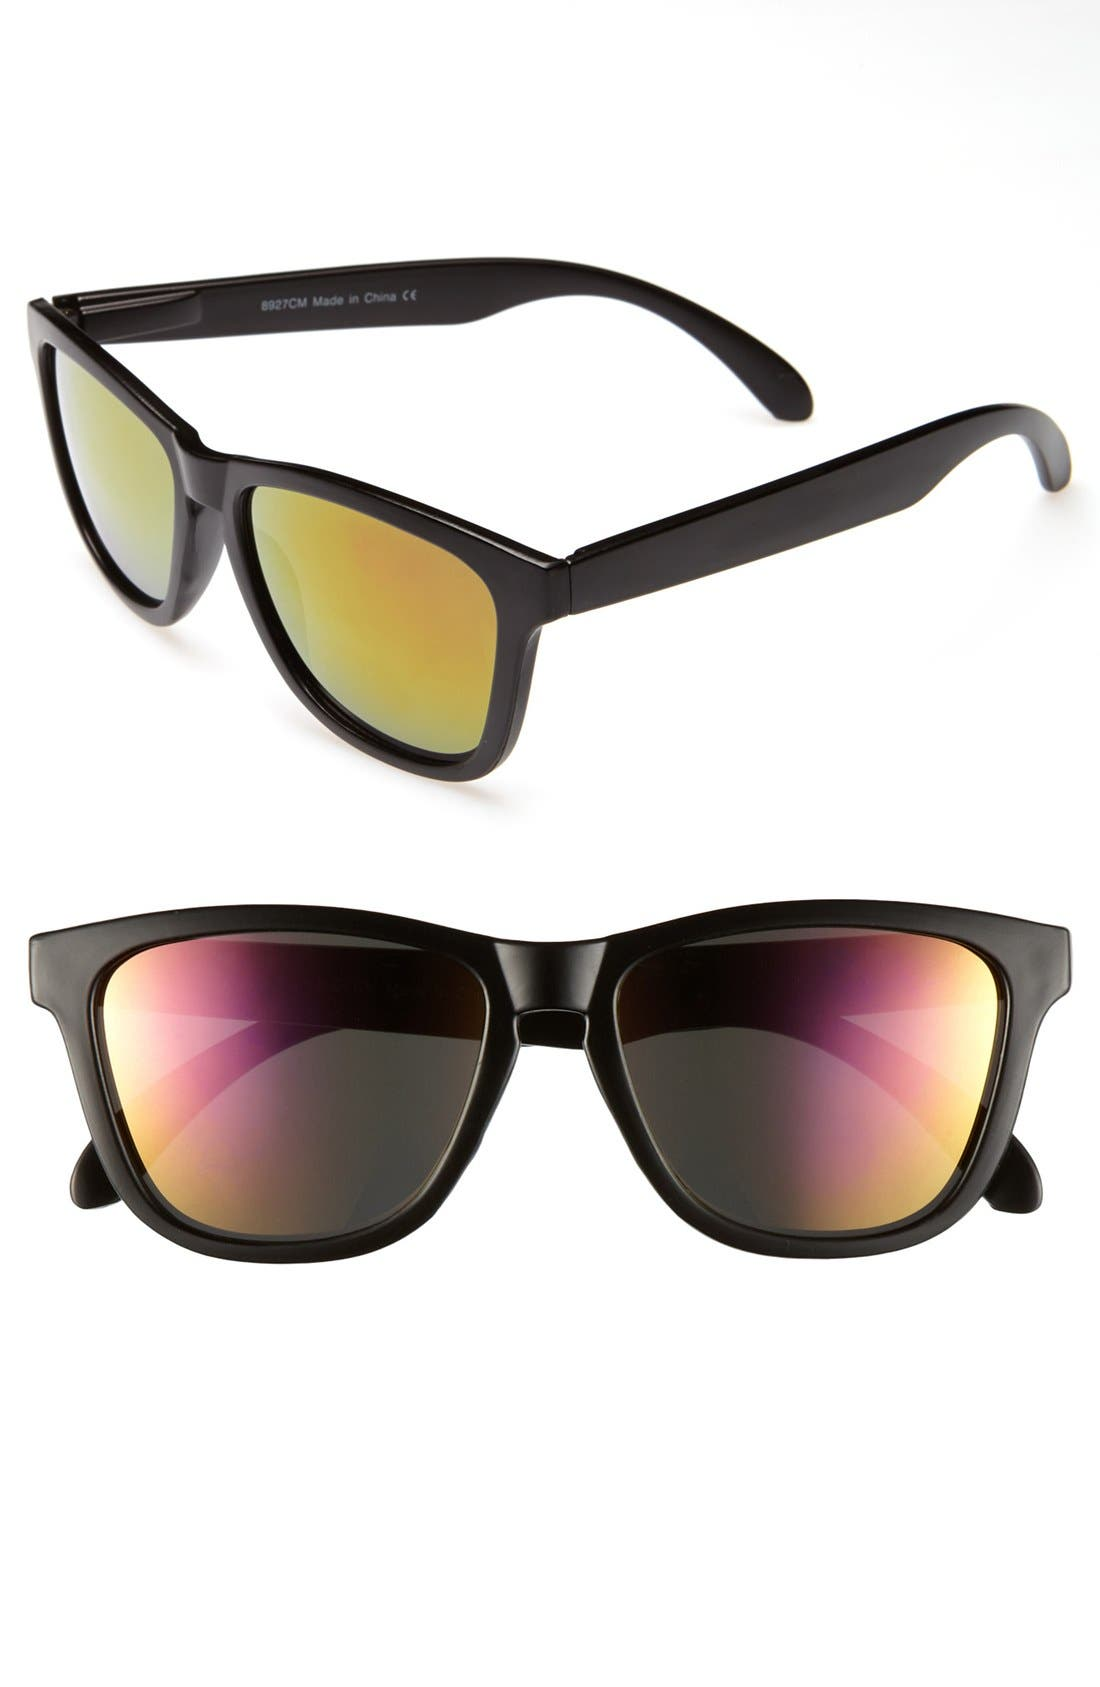 Alternate Image 1 Selected - KW 'Comet' Sunglasses